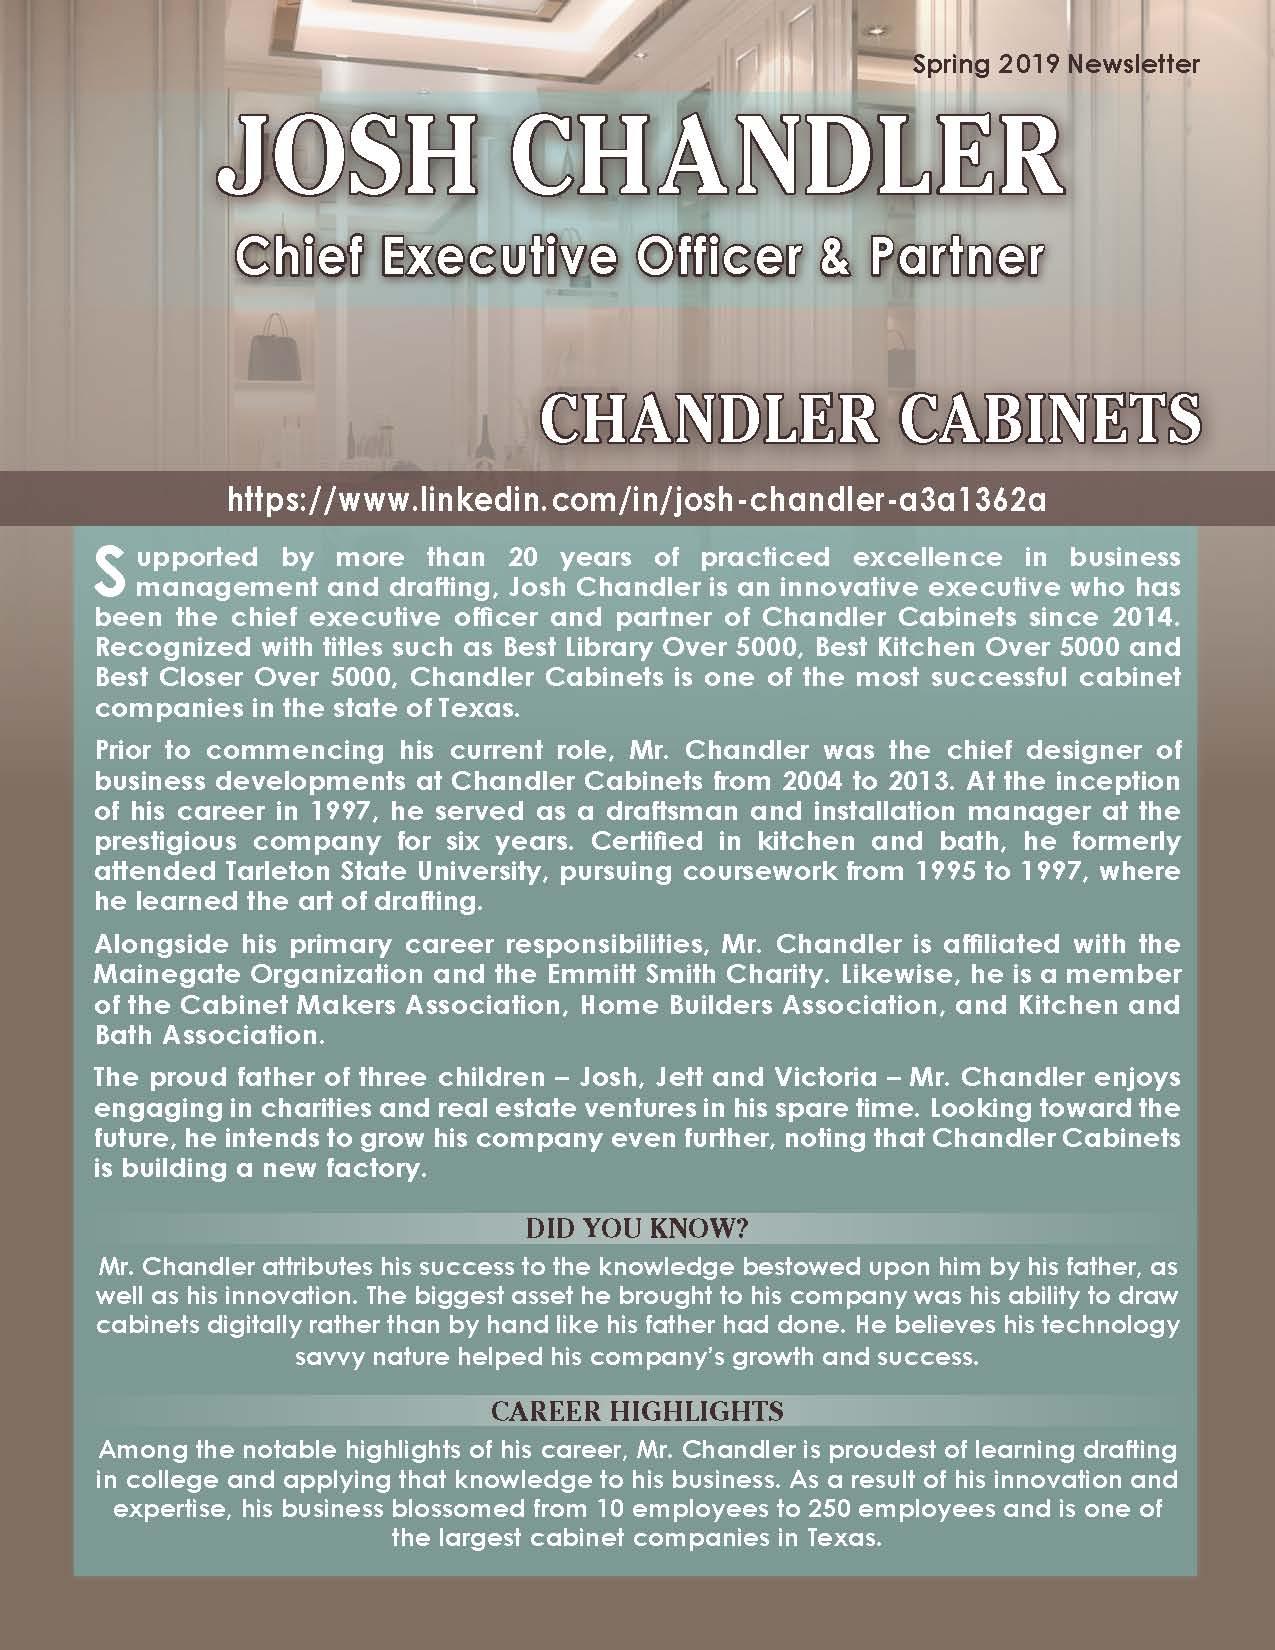 Chandler, Josh 4420875_20339738 Newsletter